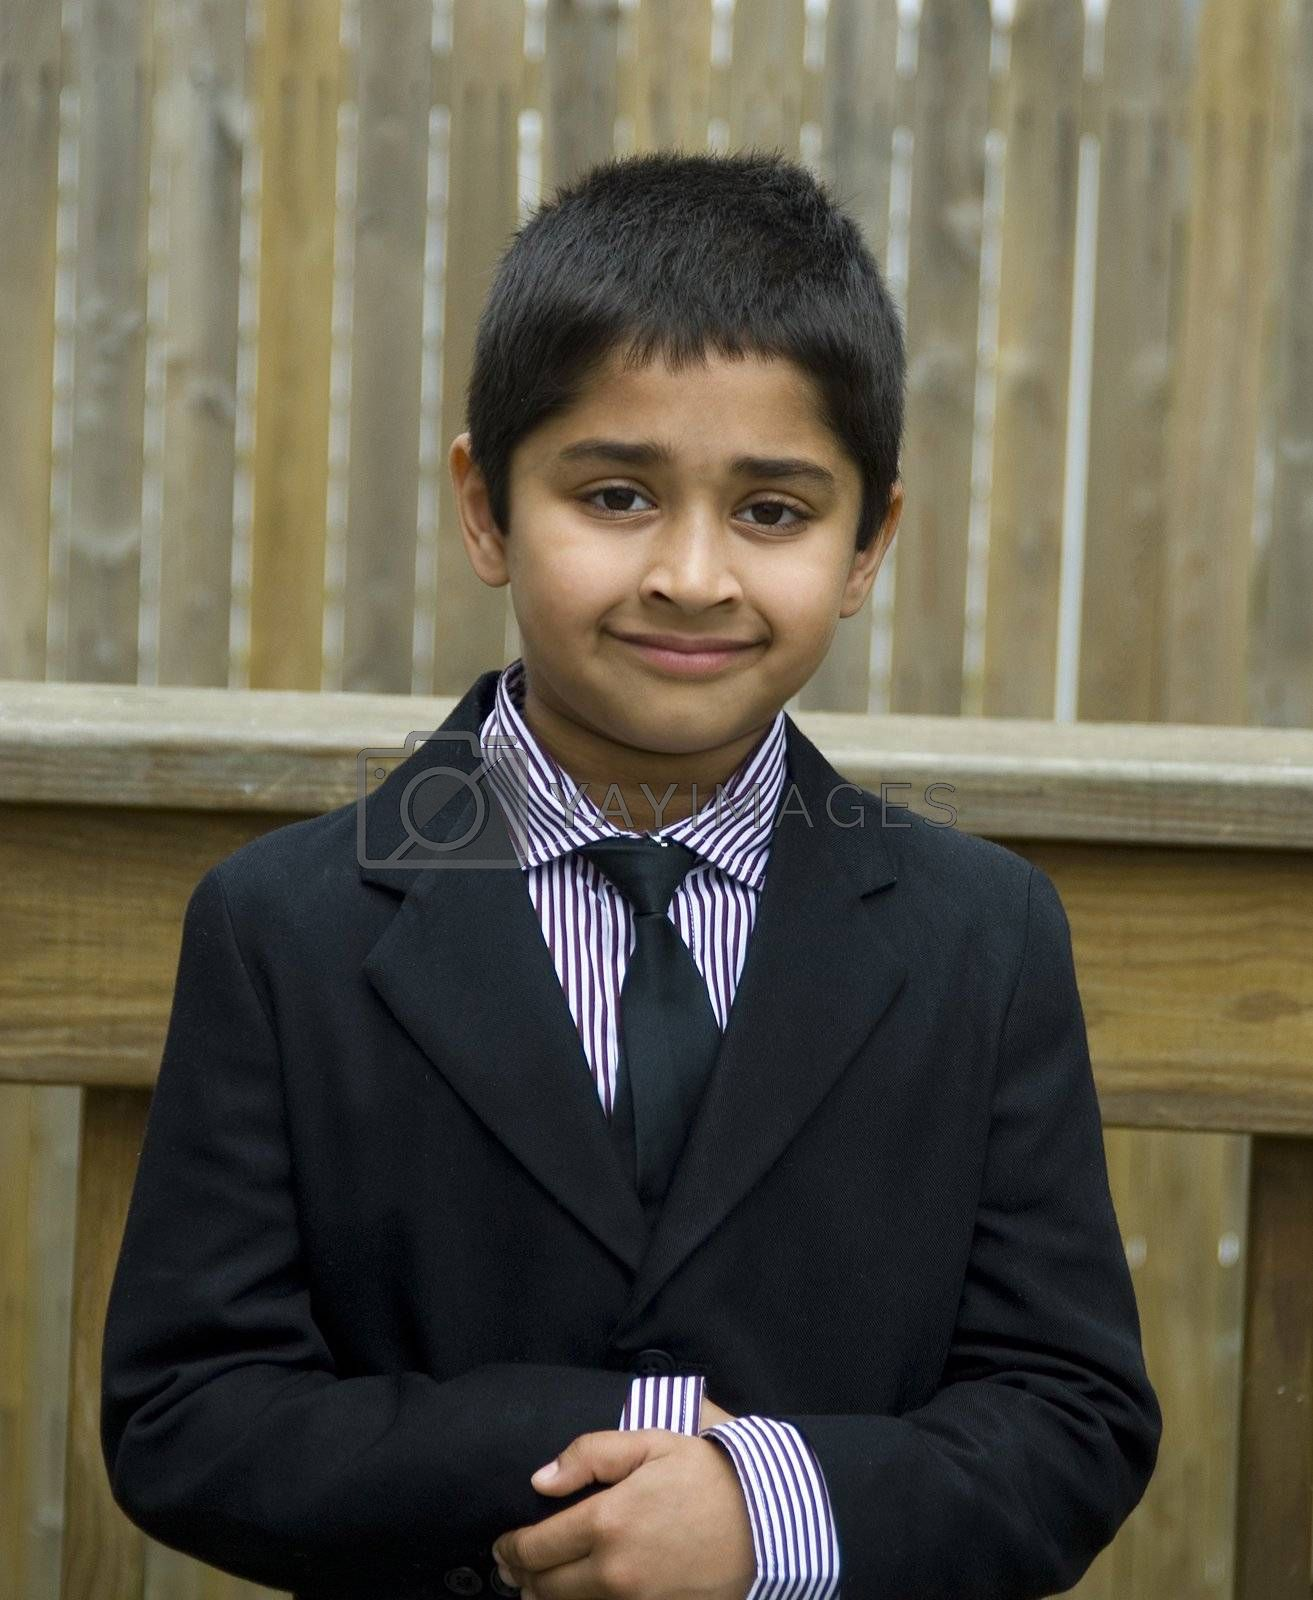 Cute kid Formally Dressed by pazham